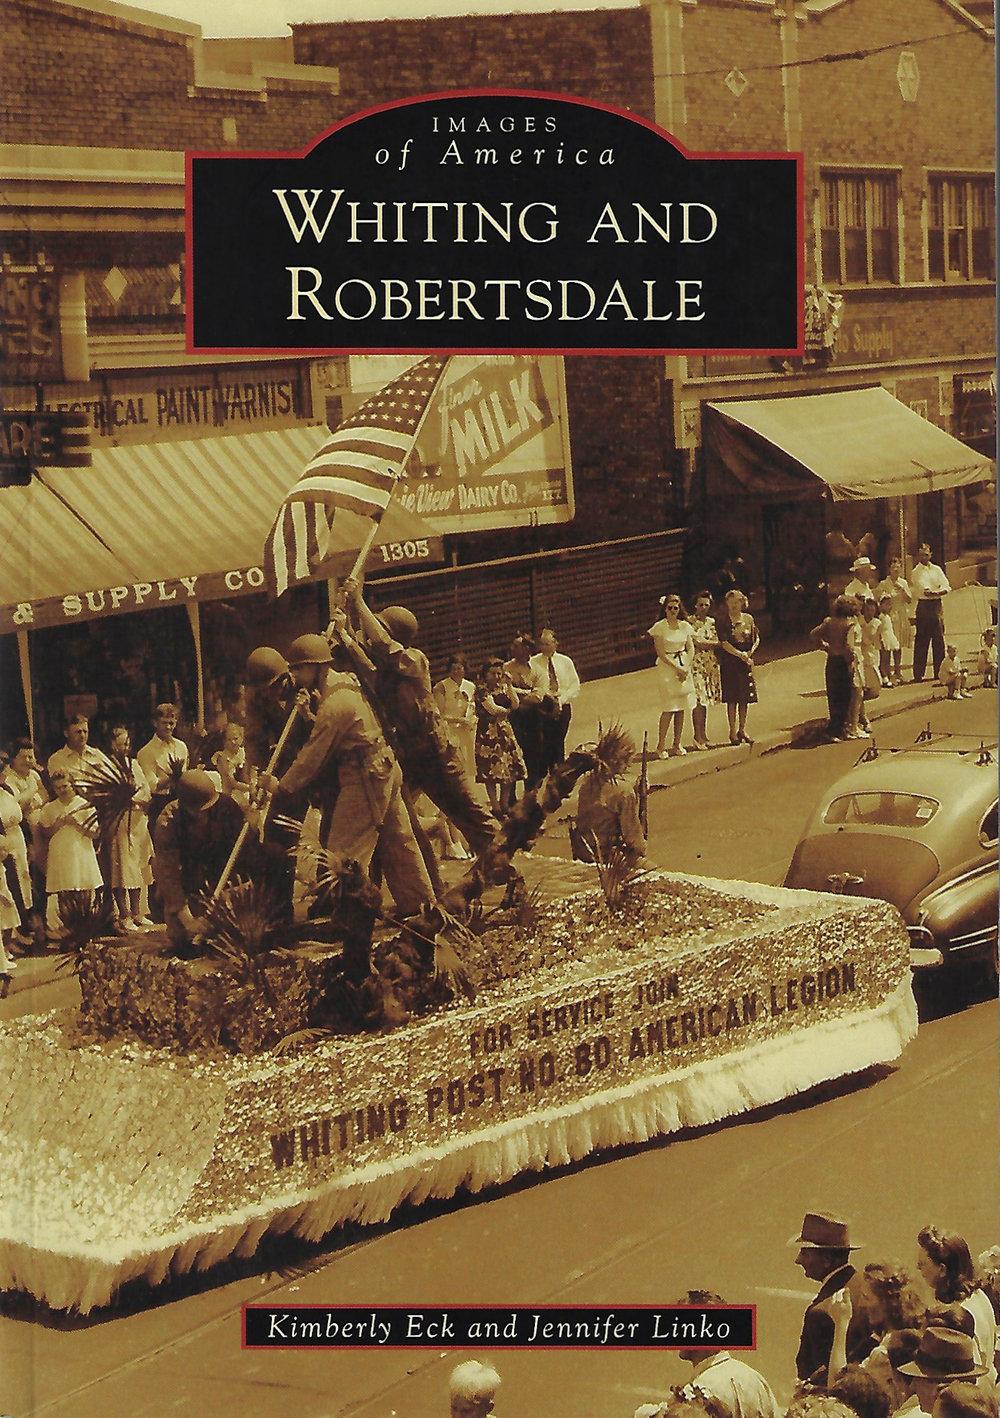 Whiting and Robertsdale by Kimberly Eck & Jennifer Linko, 2013